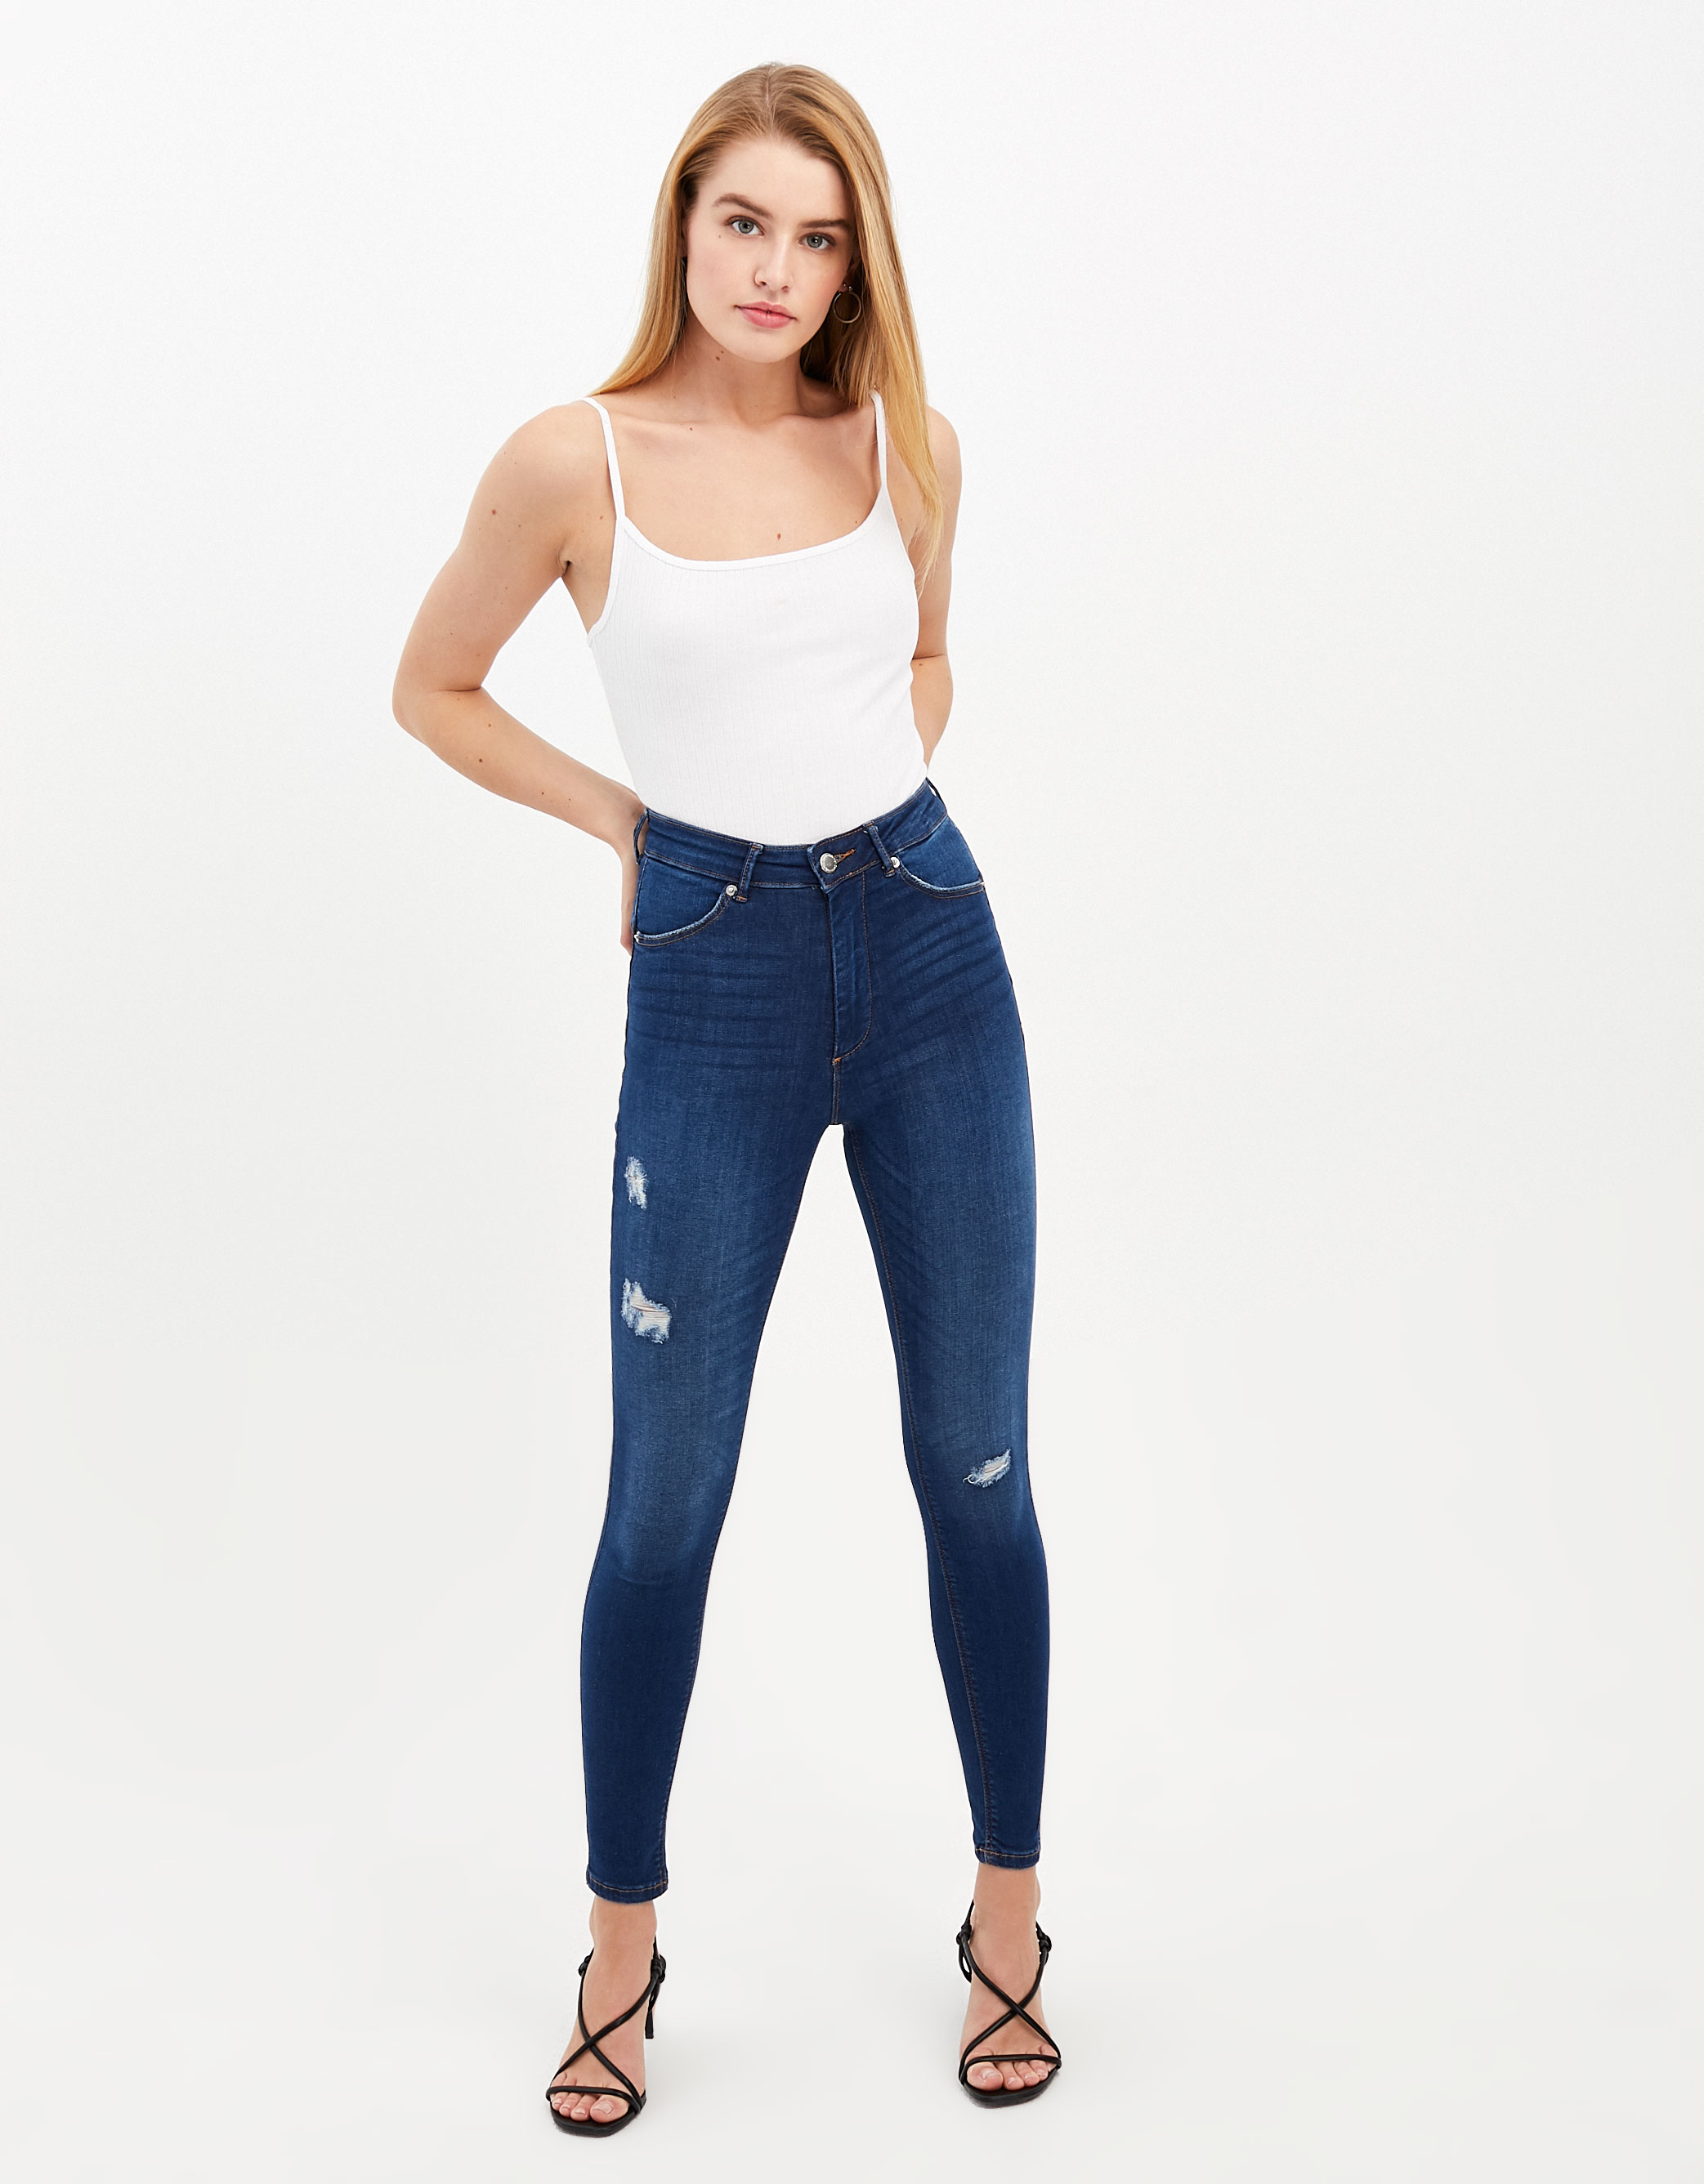 1008abeb58 High Waist Push Up Jeans   TALLY WEiJL Online Shop